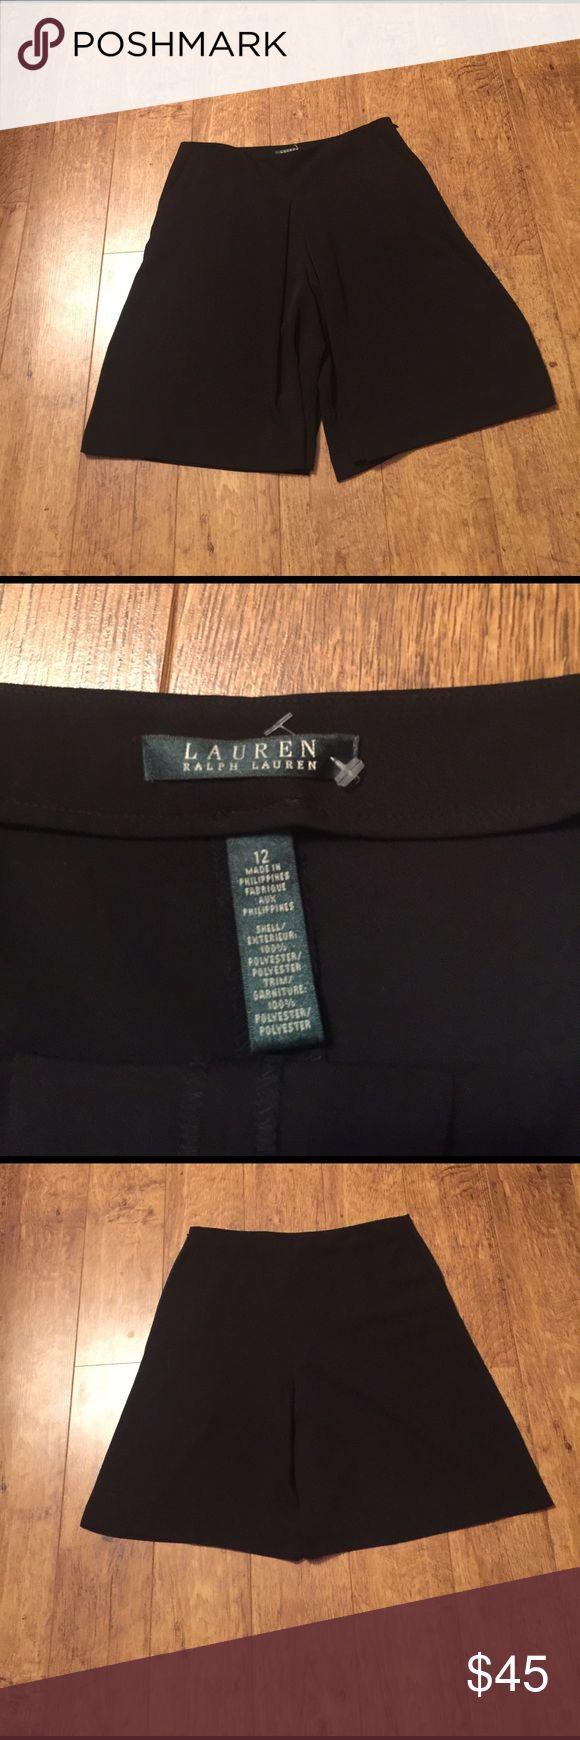 On trend Ralph Lauren Gaucho skirt Super on trend gaucho style skirt with pockets and side zipper. Like new condition Lauren Ralph Lauren Skirts Mini